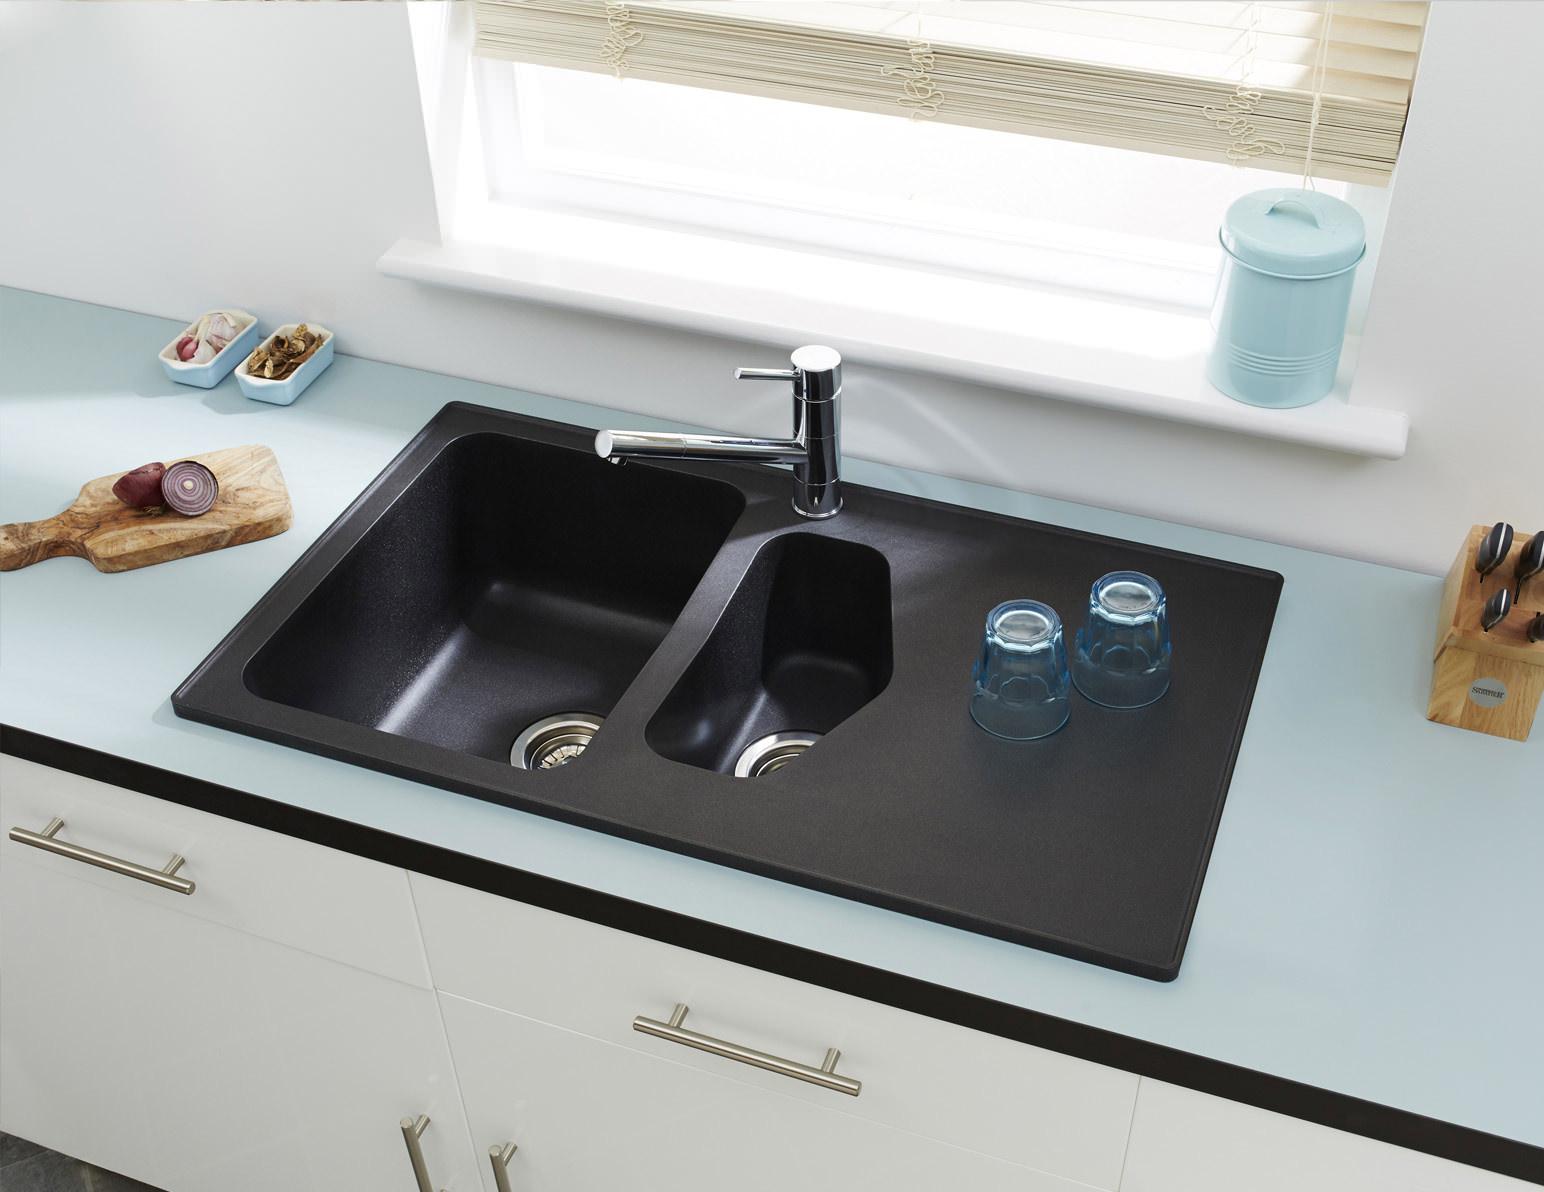 Composite Granite Sinks Vs Stainless Steel Miseno Kitchen